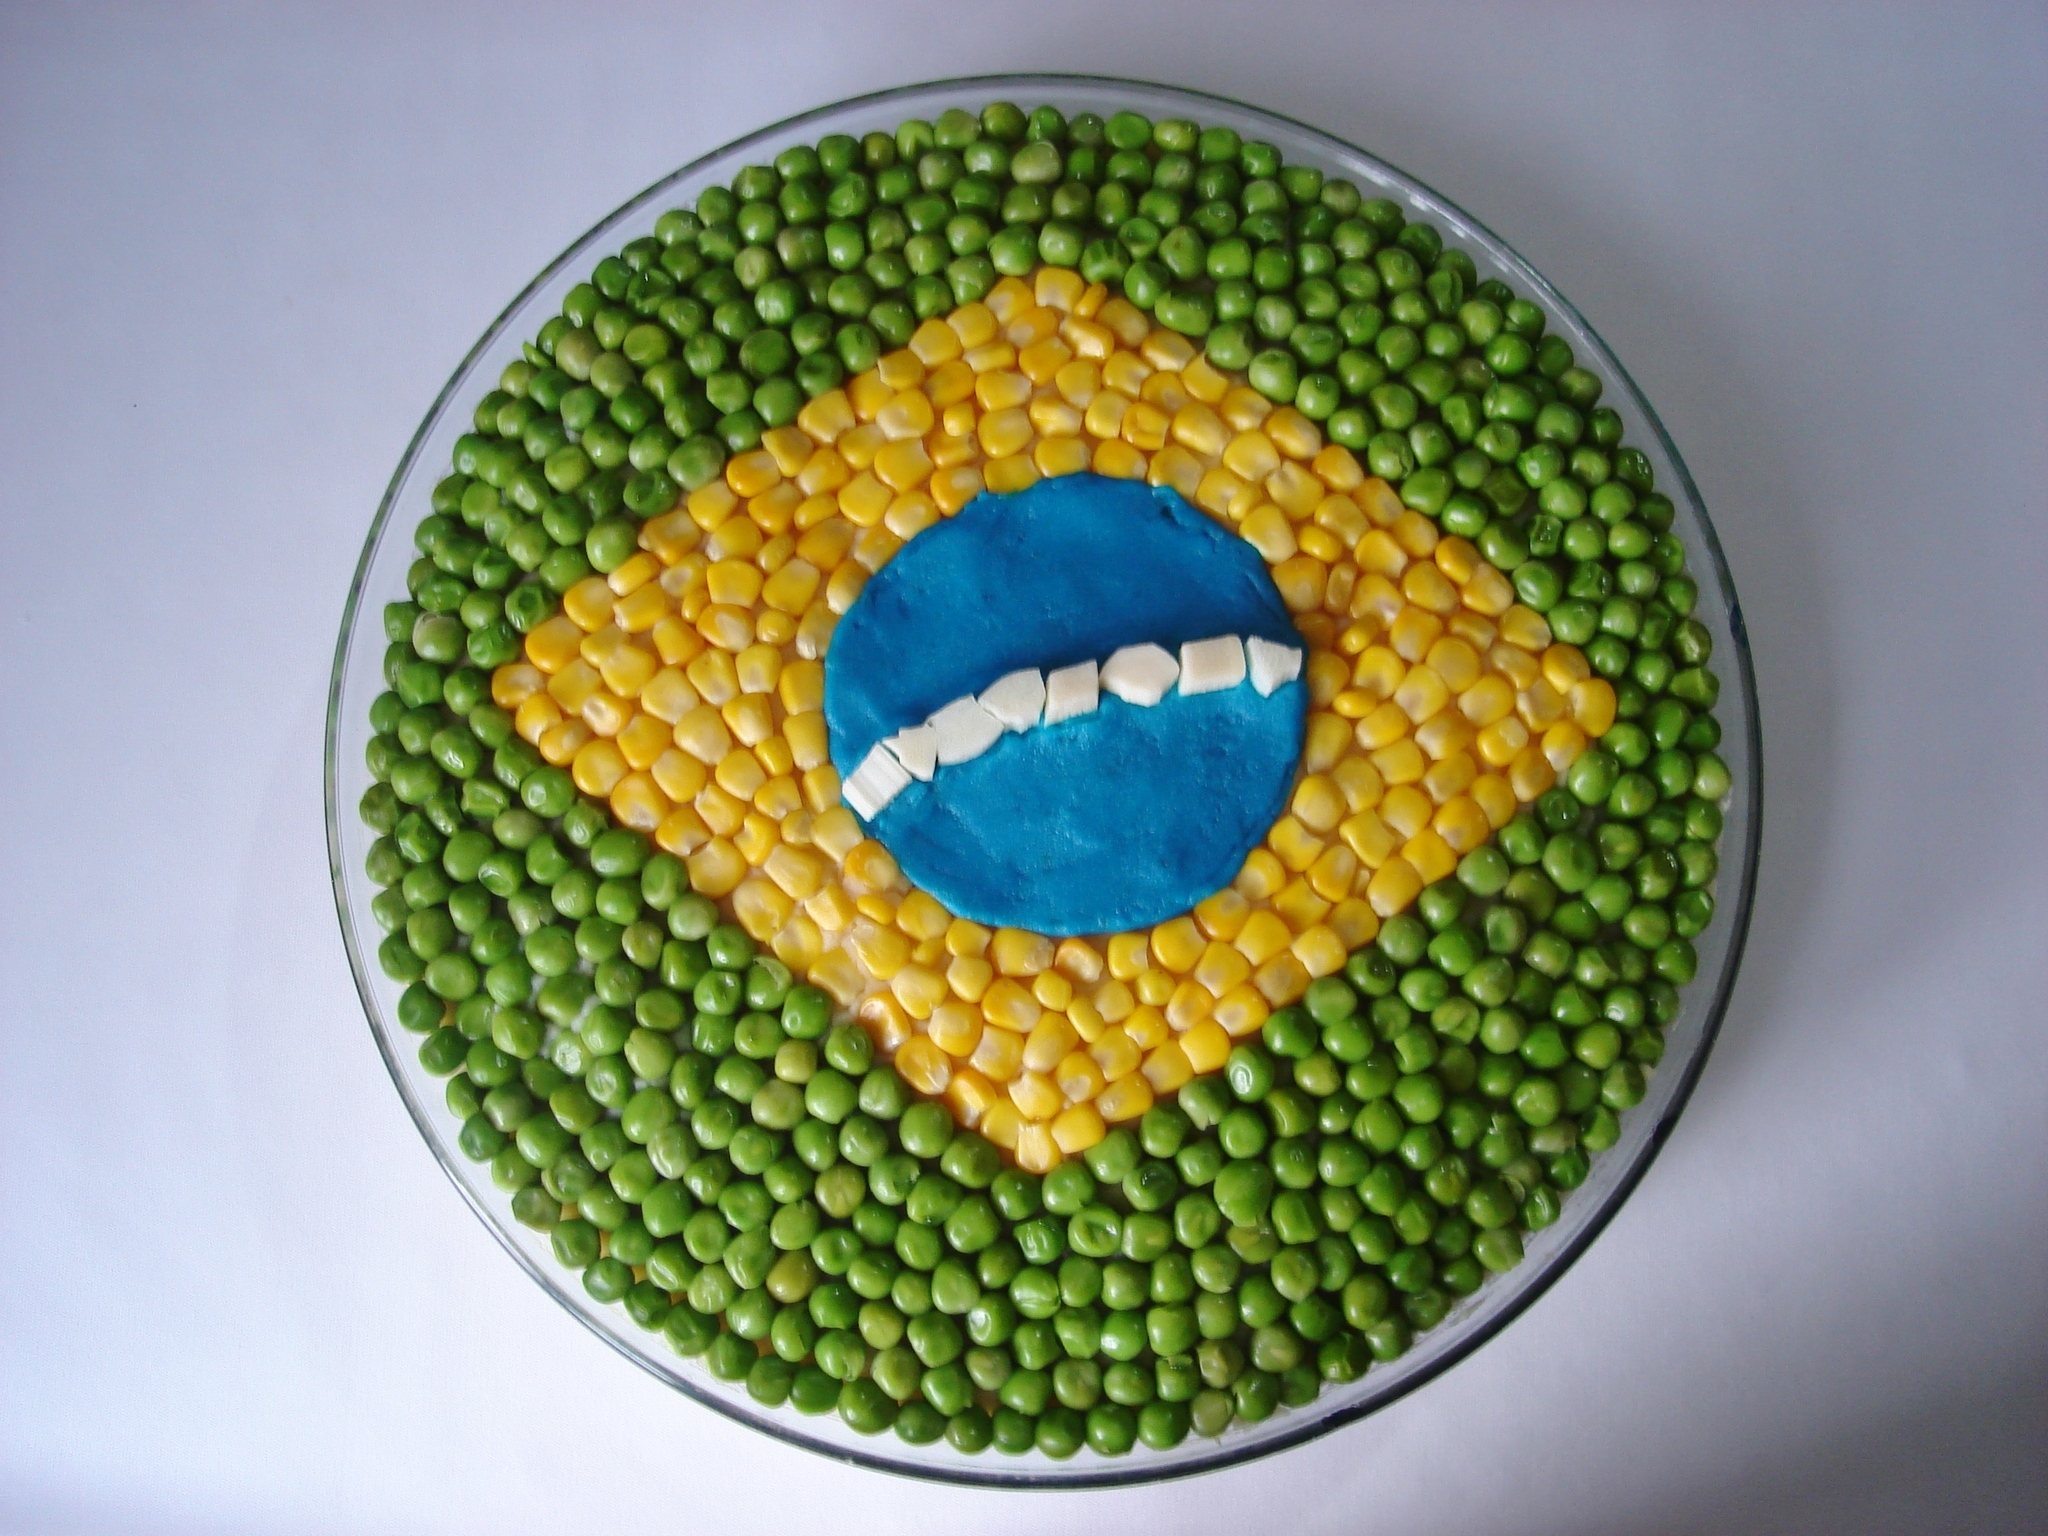 Copa do Mundo Brasil 2014: Torta de frango